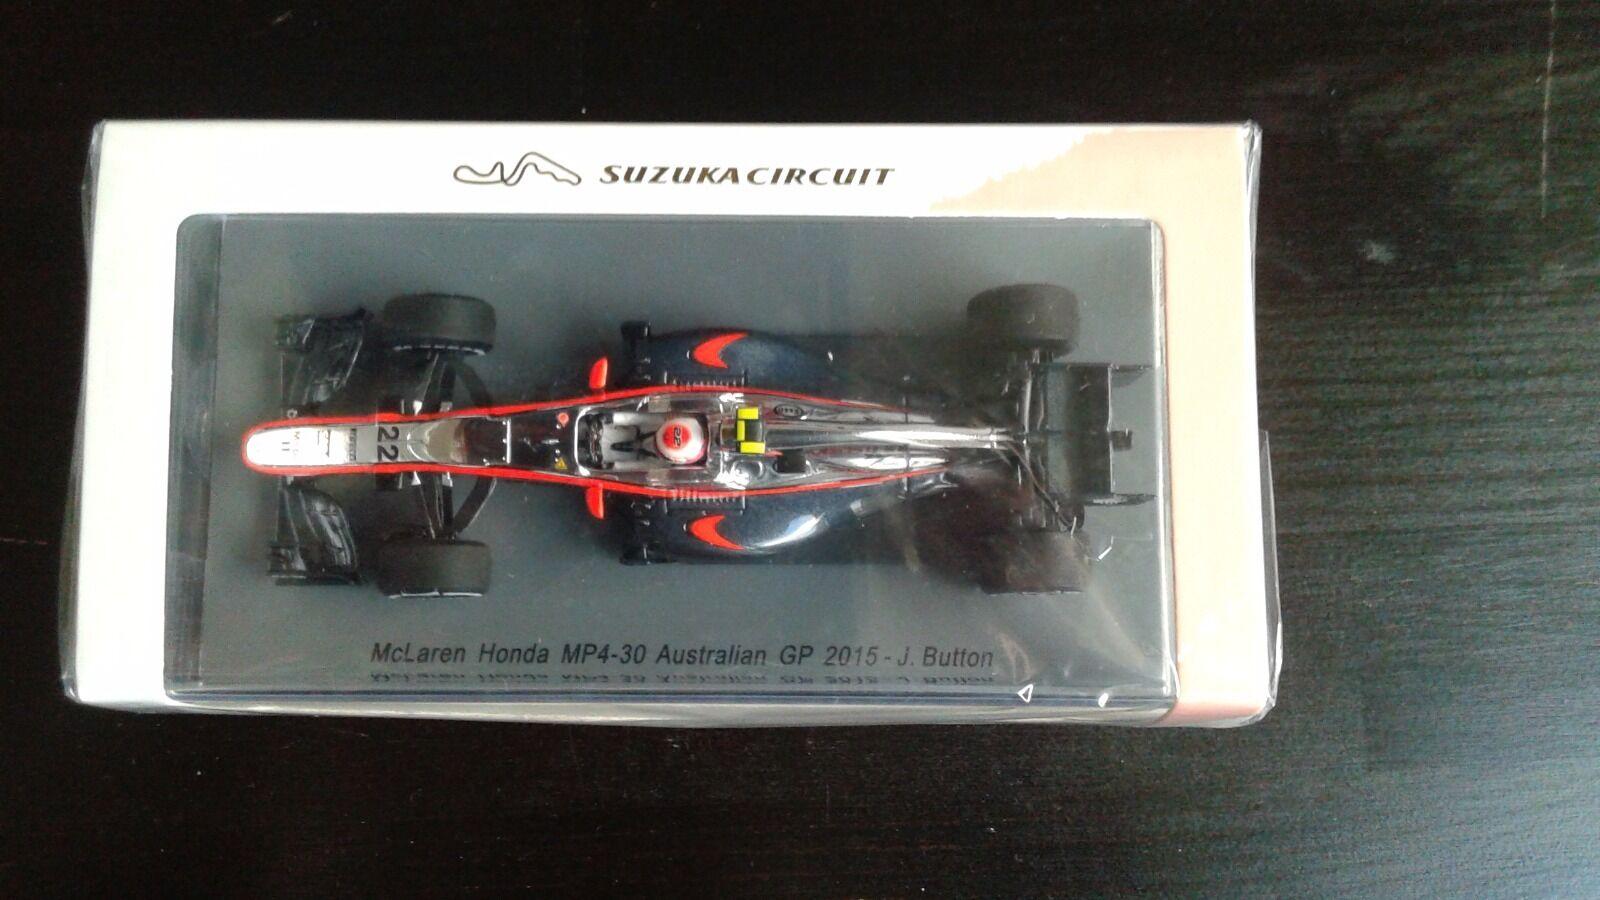 McLaren Honda MP4-30, Jenson Button Australian GP 2015 Suzuka Circuit 1 43